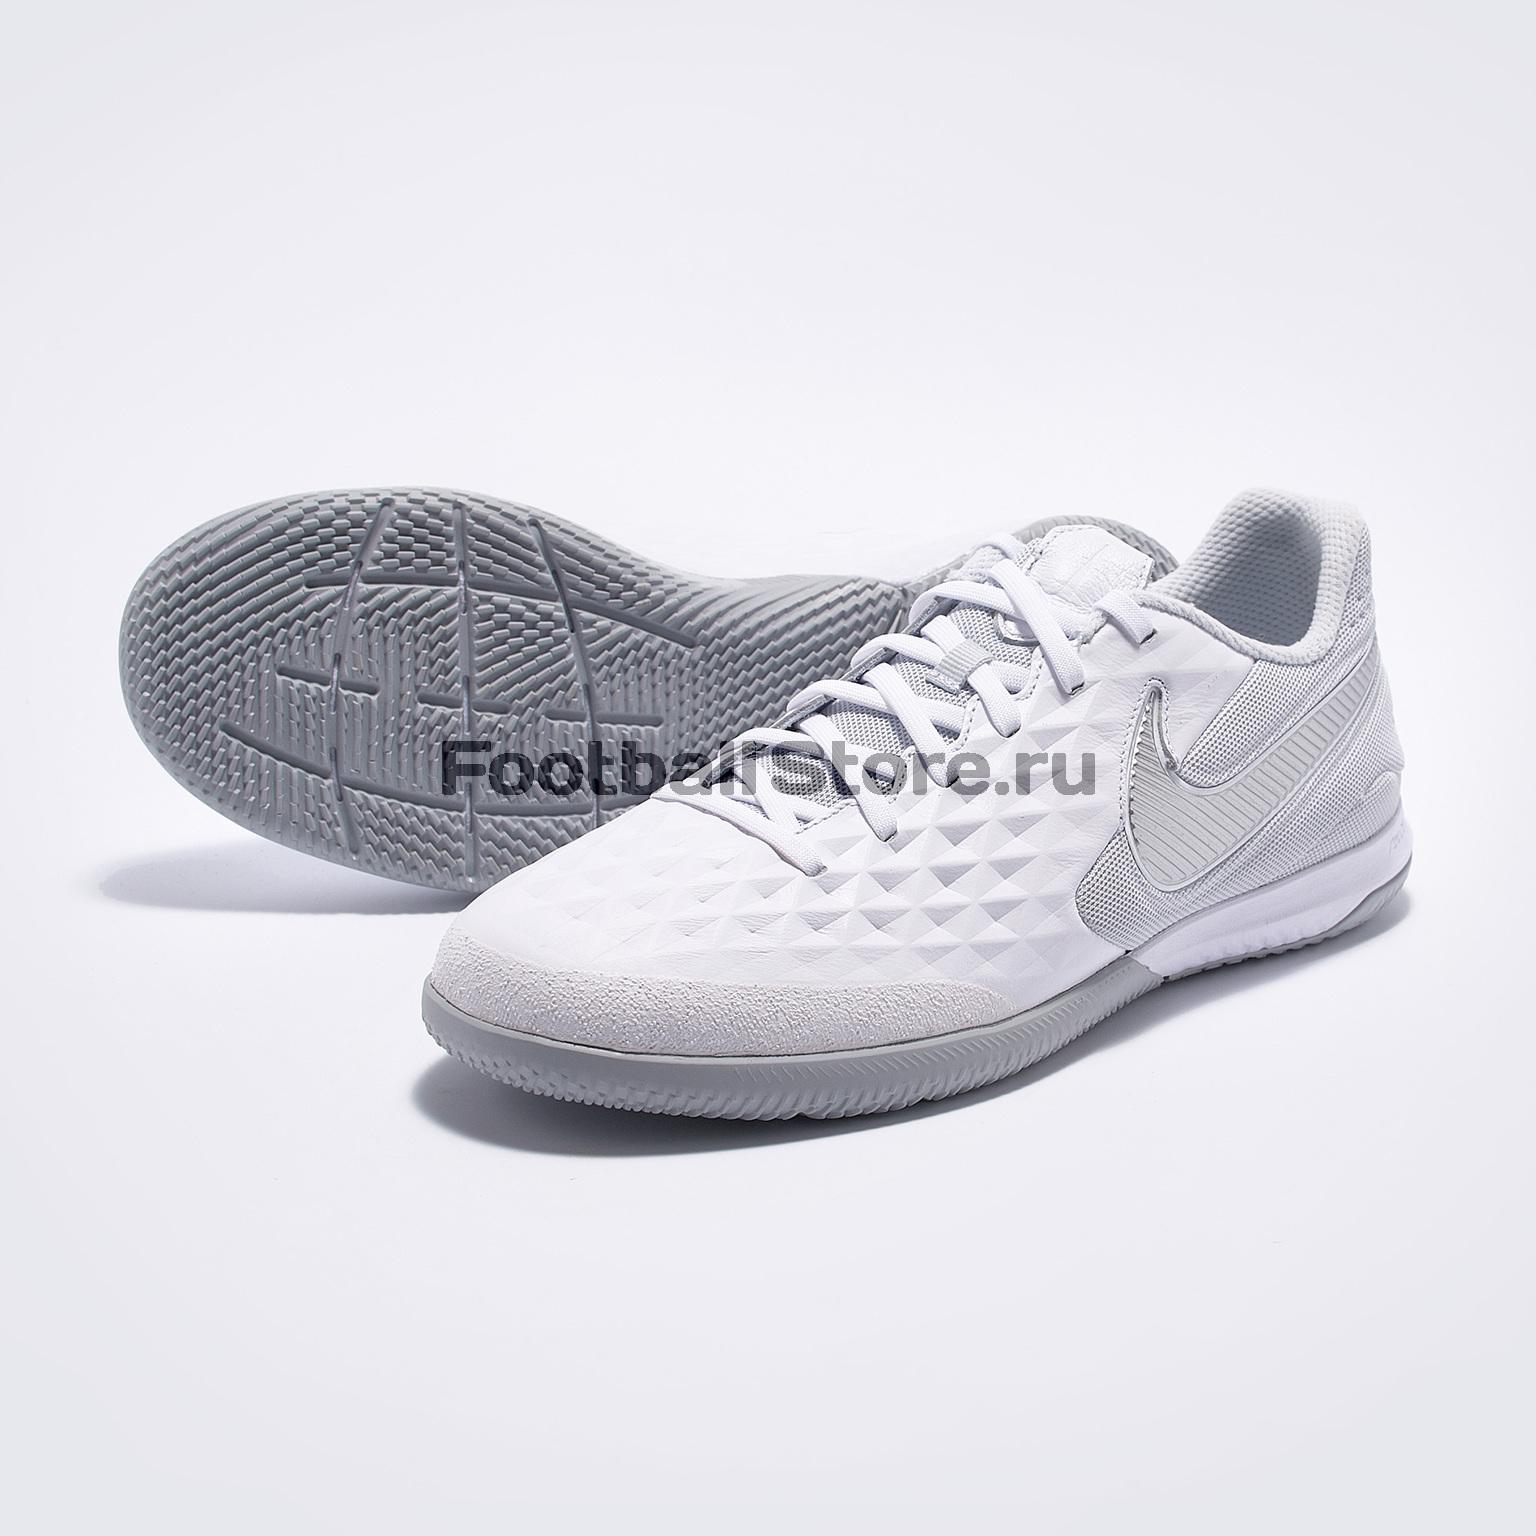 Футзалки Nike React Legend 8 Pro IC AT6134-100